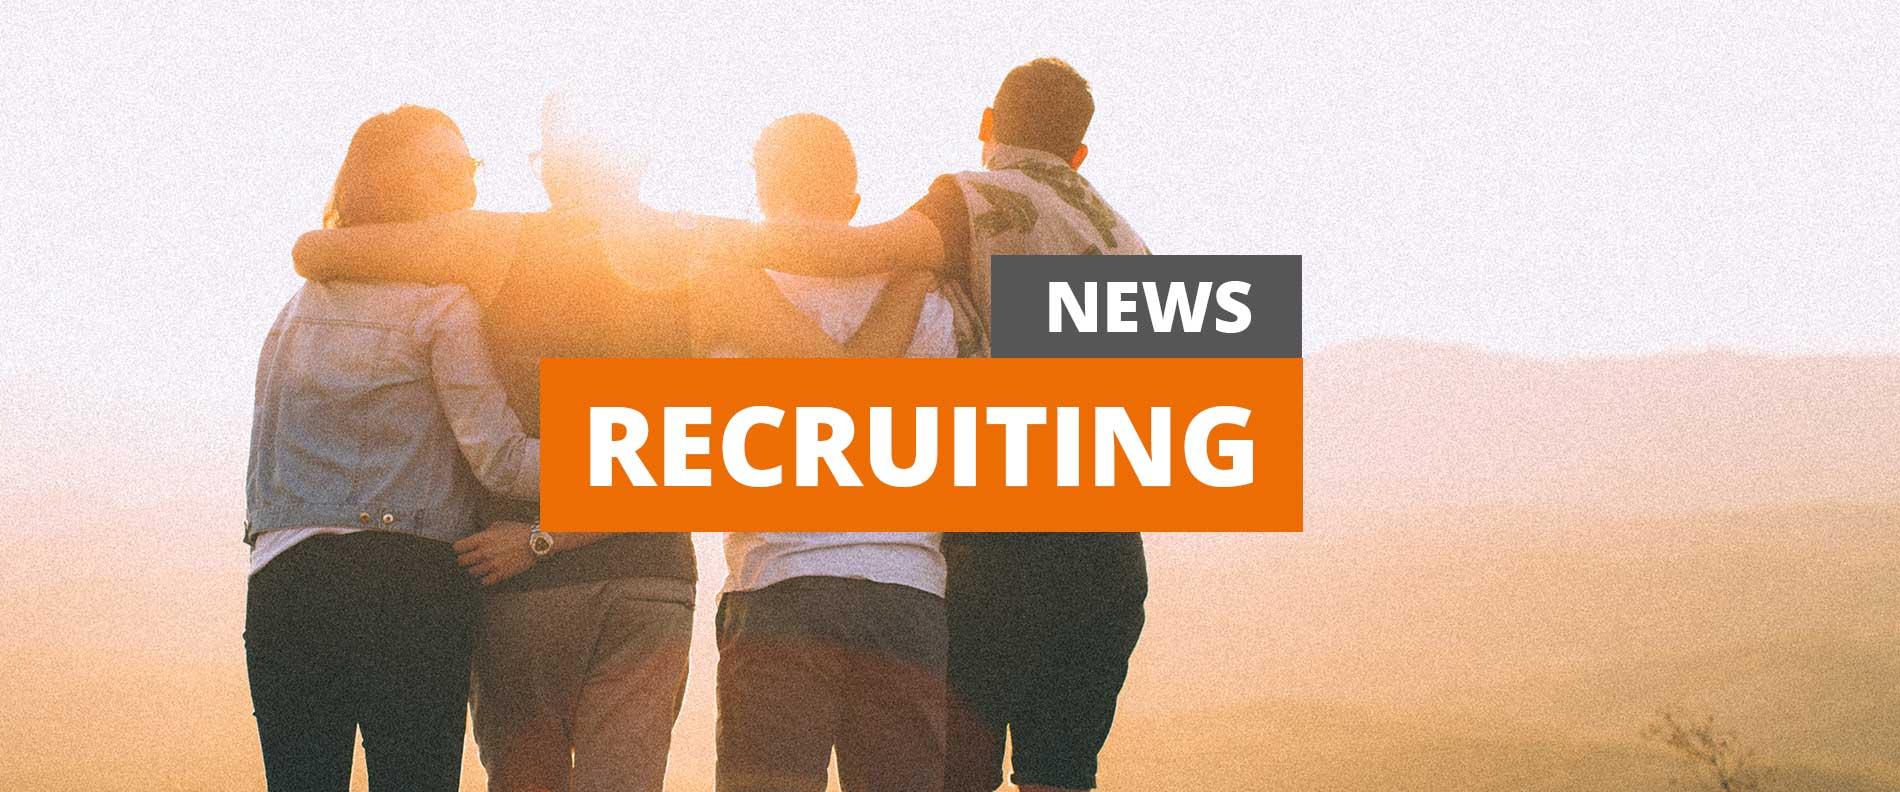 recruiting-news_2019-02-25